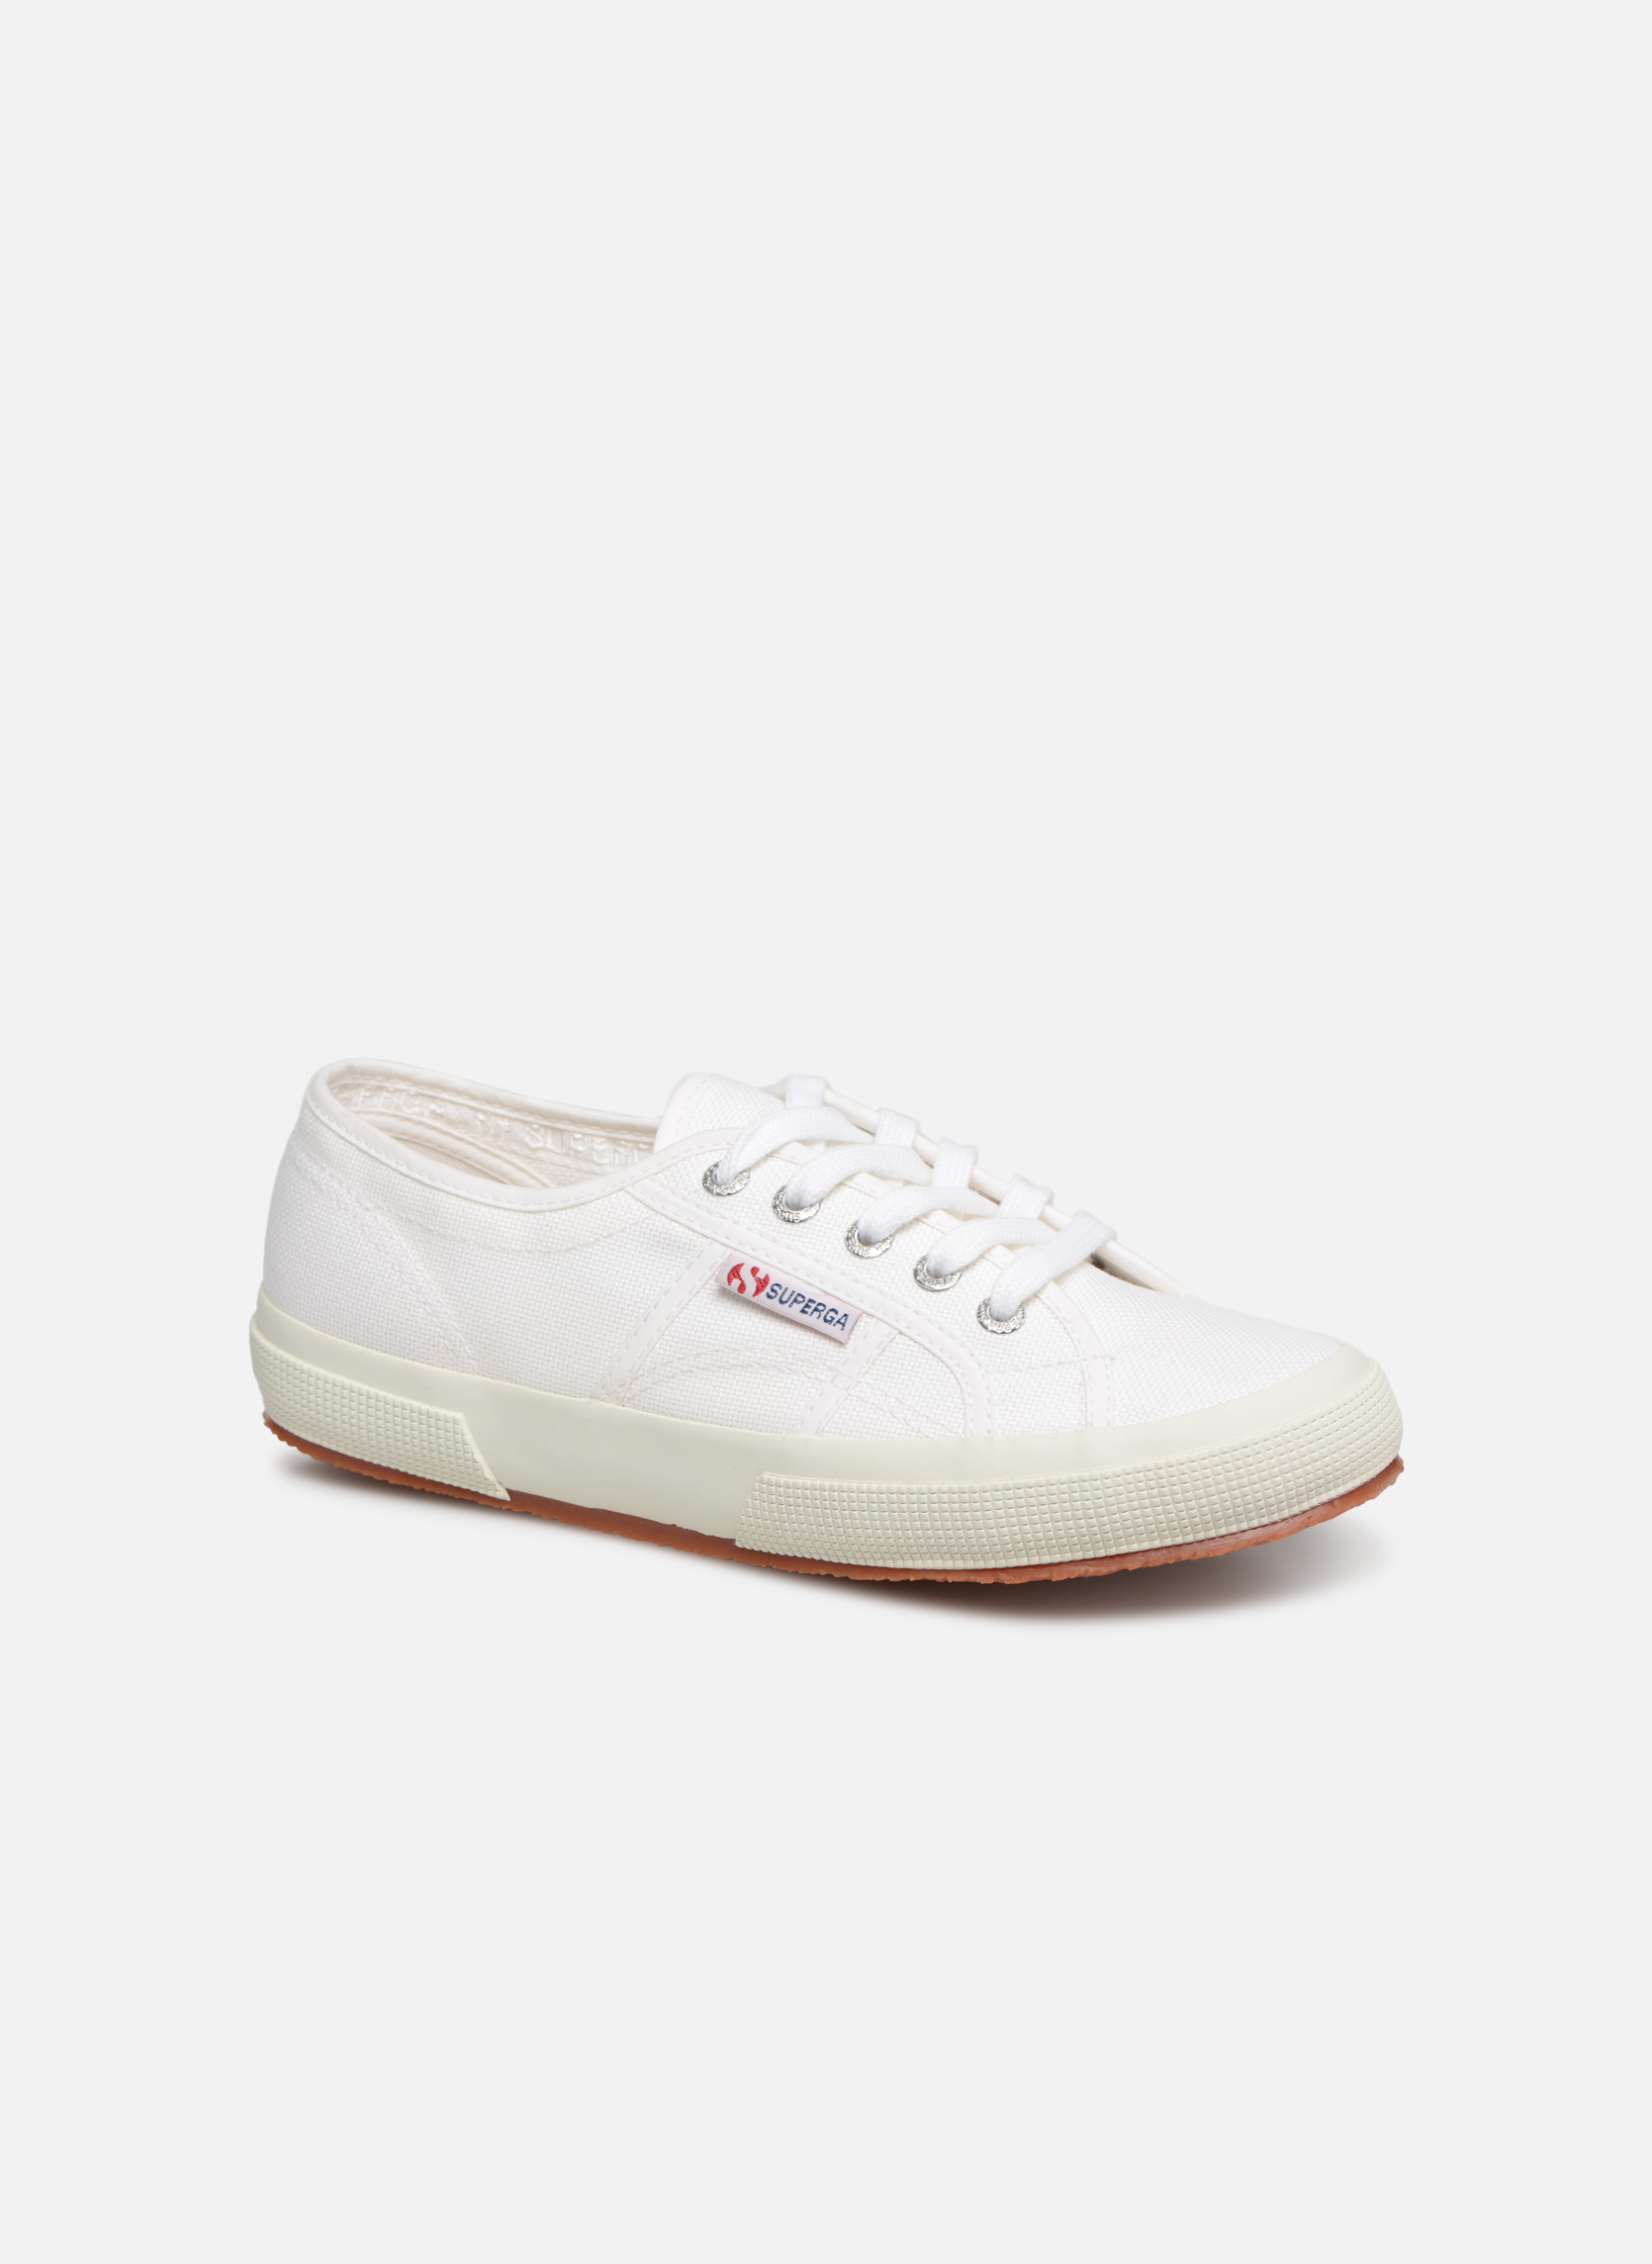 half off ed629 5edef ... Sneakers Dam 2750 Cotu W